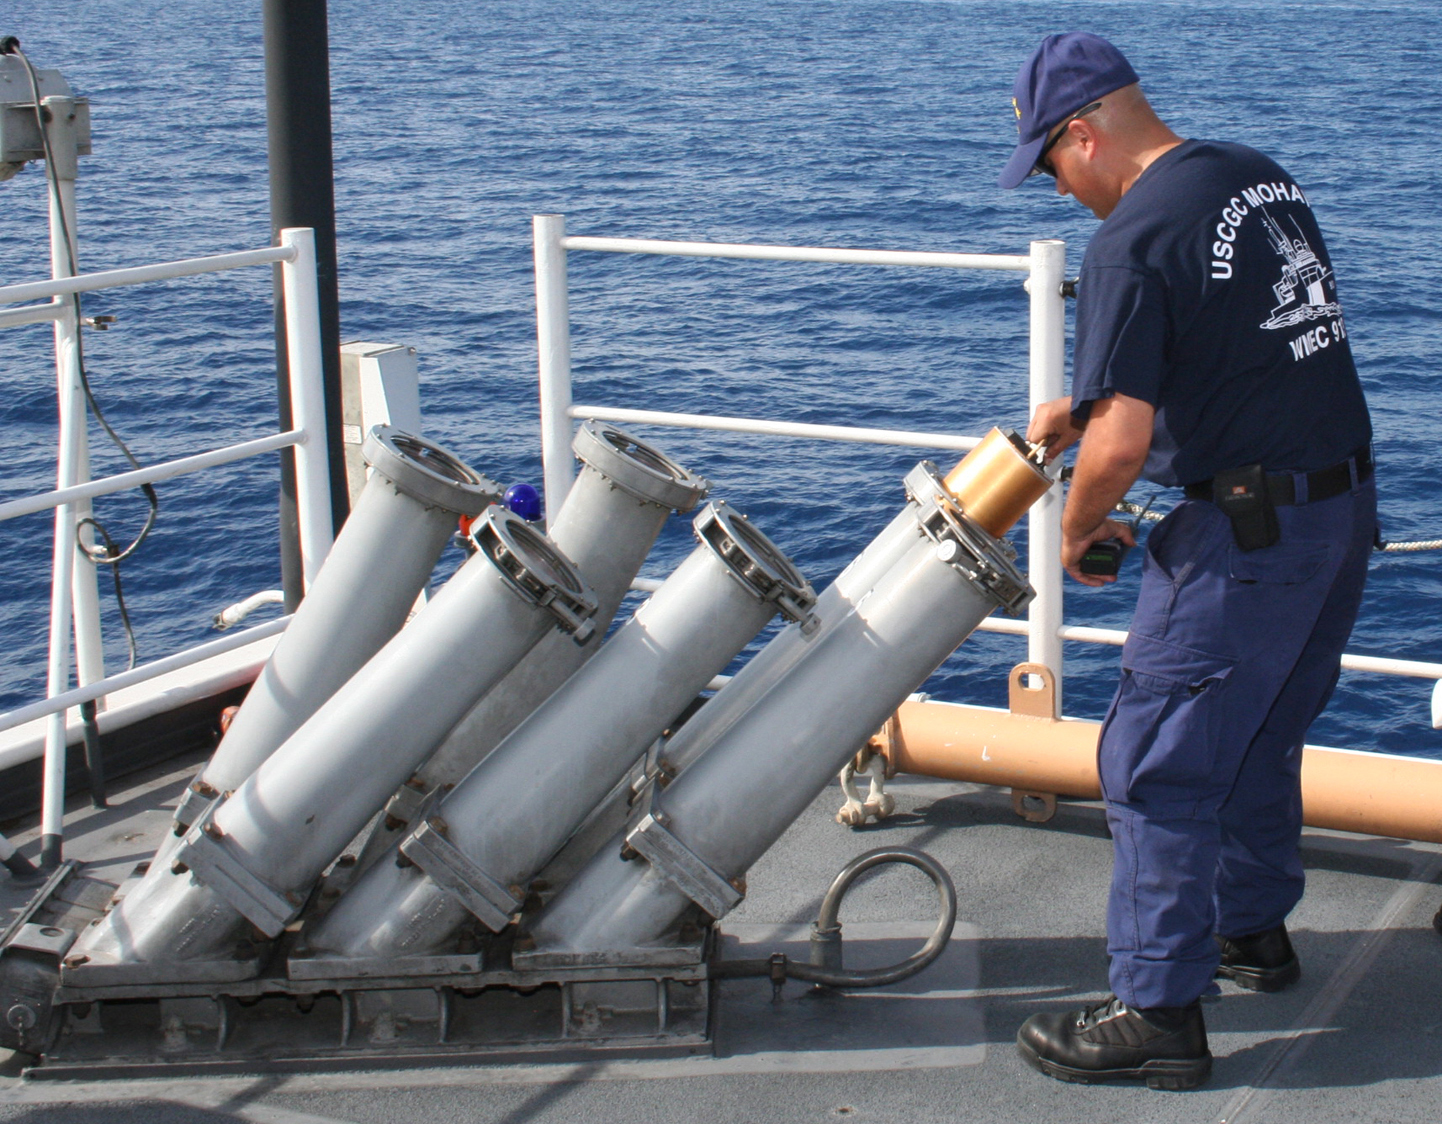 US_Navy_090915-N-1938G-019_U.S._Coast_Guard_Gunner%27s_Mate_3rd_Class_Antonio_Seisdedos%2C_aboard_the_USCGC_Mohawk_%28WMEC_913%29_check_the_Mark_36_Super_Rapid_Bloom_Off-board_Chaff_%28SRBOC%29_for_correct_voltage_before_firing.jpg